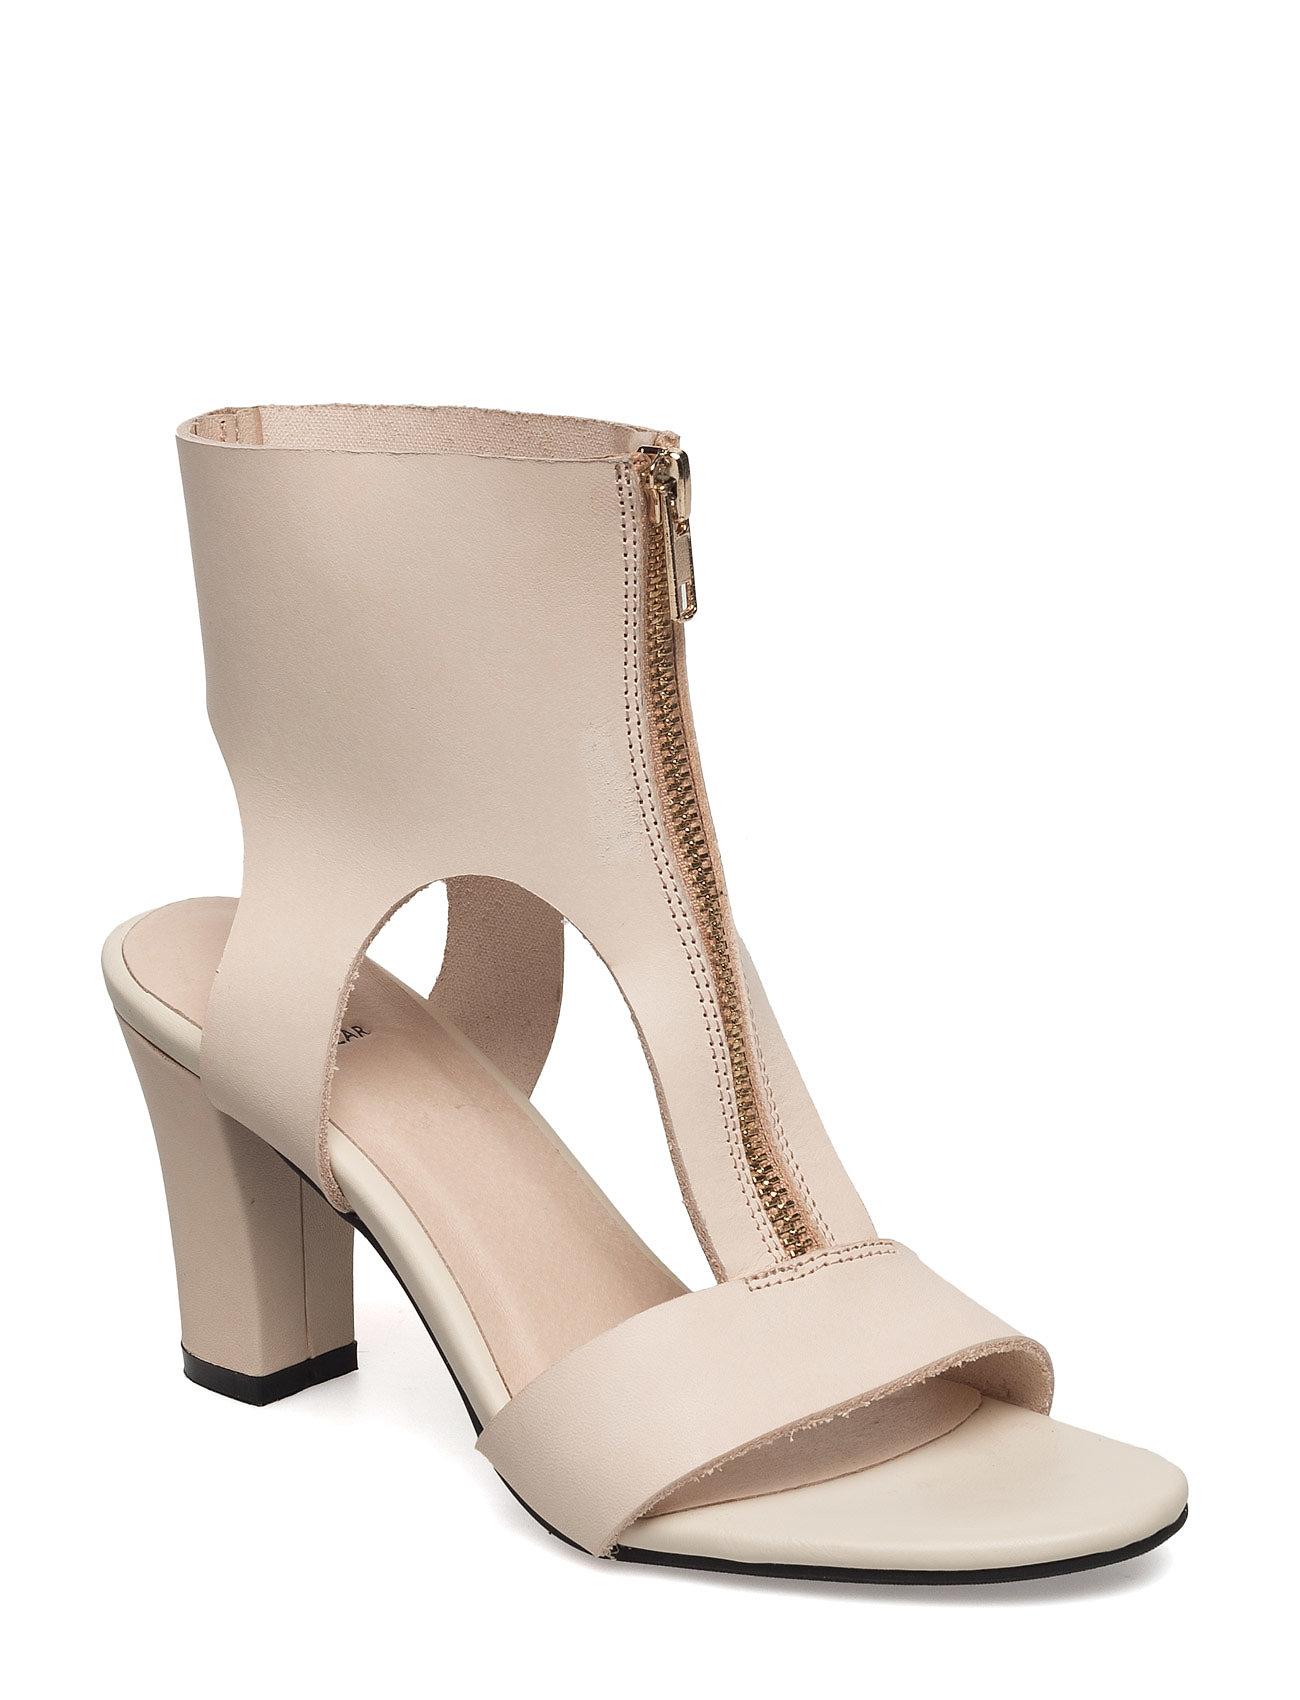 Stb1047 Shoe The Bear Sandaler til Damer i Nøgen